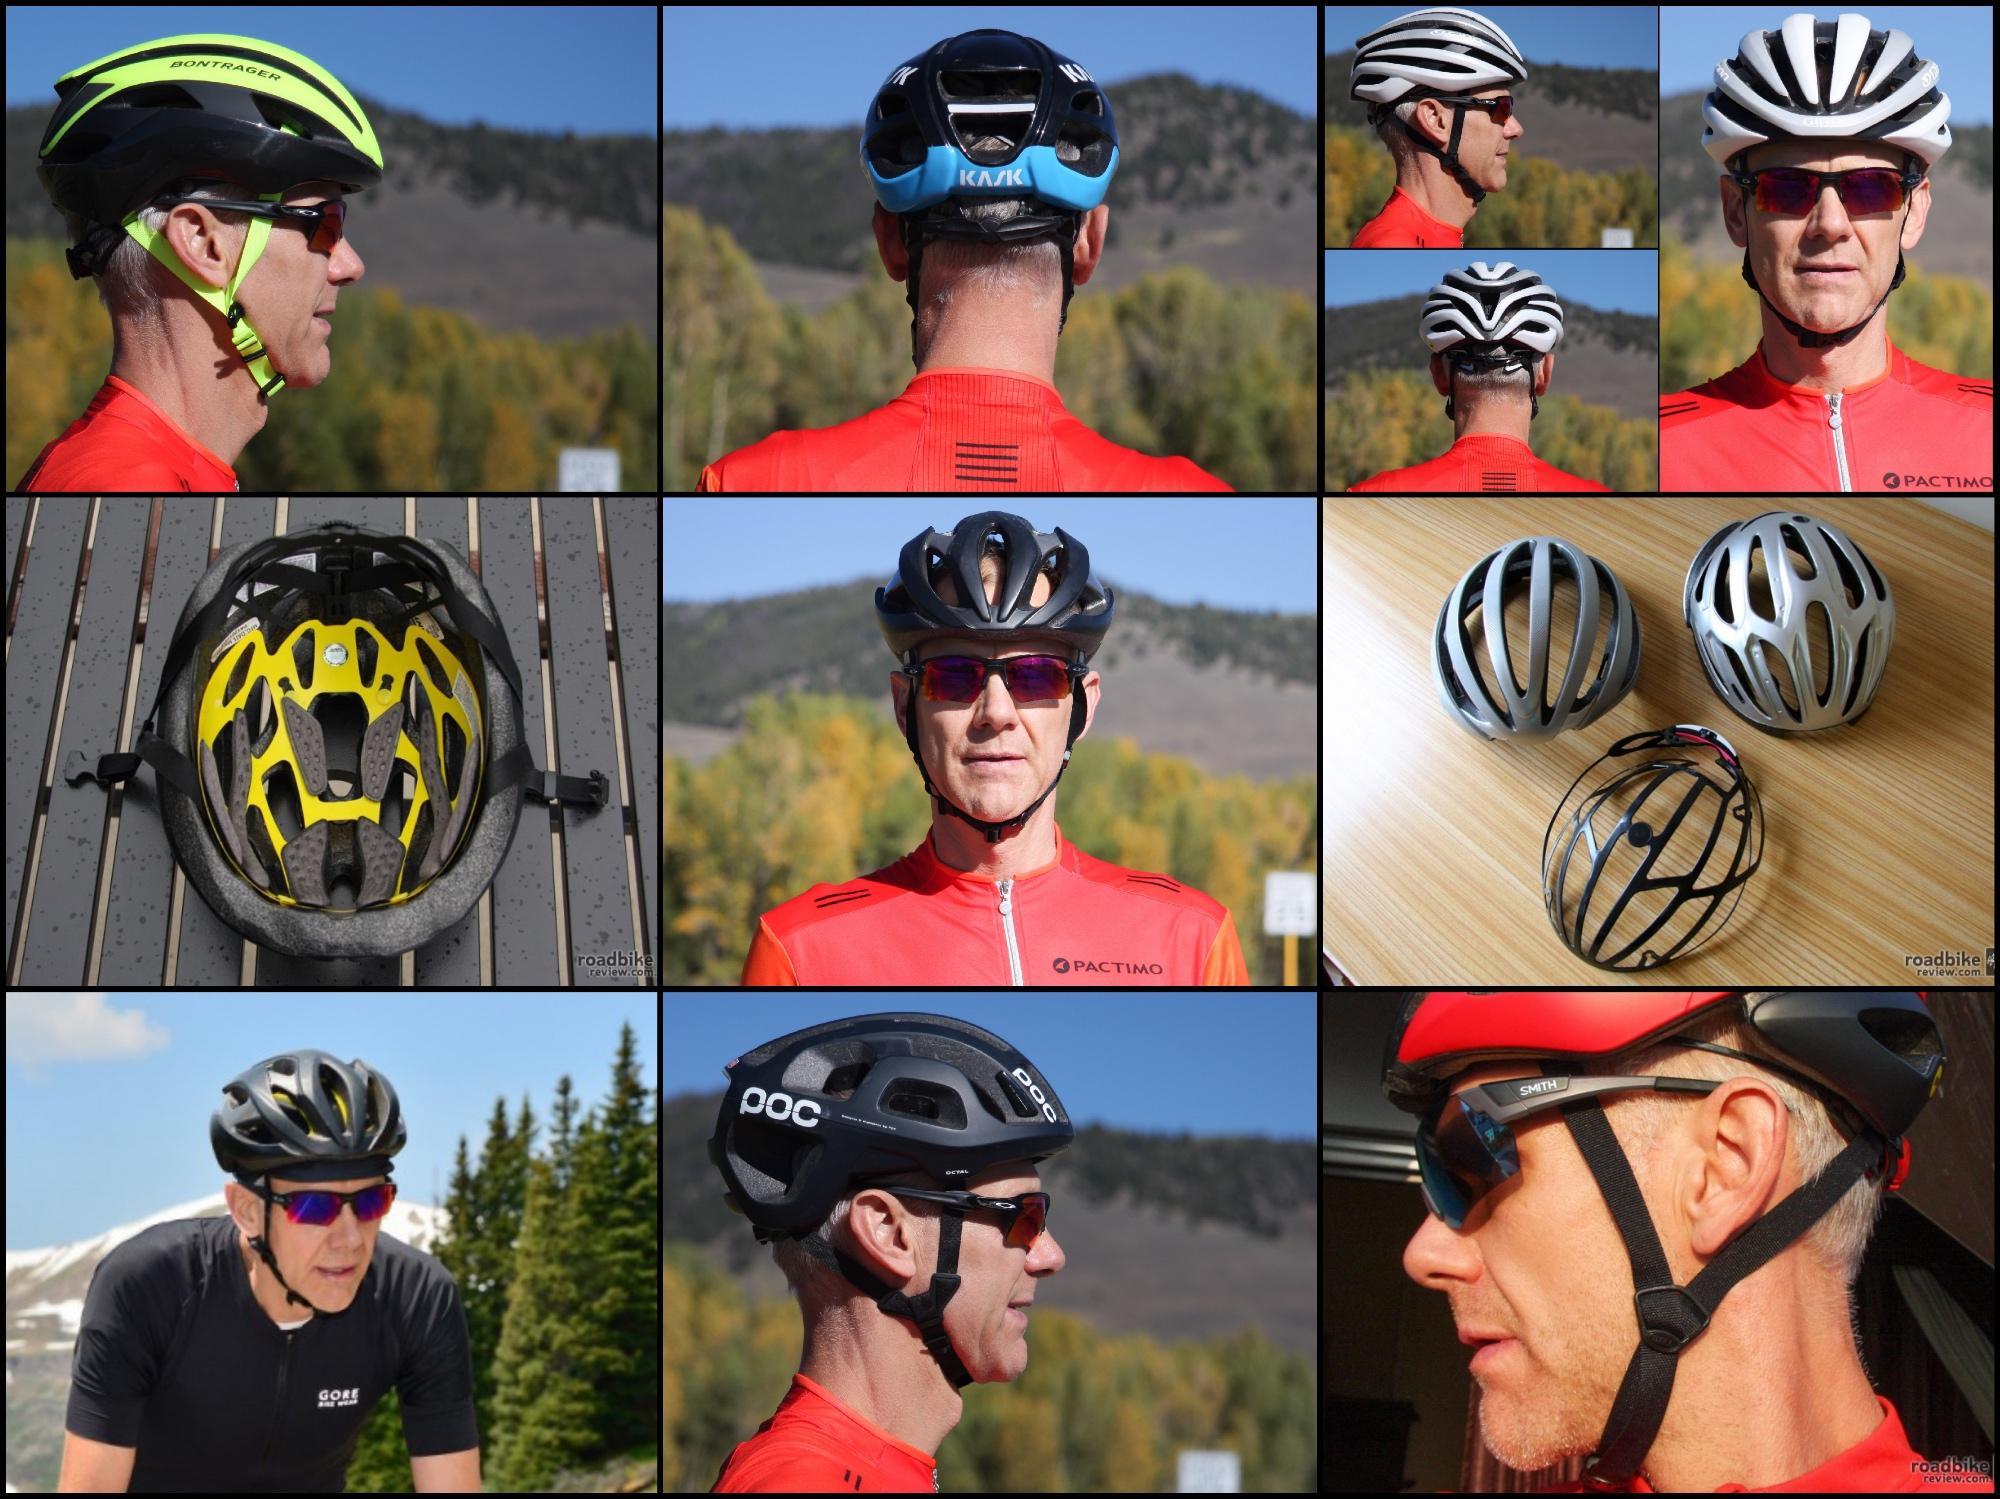 e03e1be4a0c Best Road Bike Helmets | Road Bike News, Reviews, and Photos